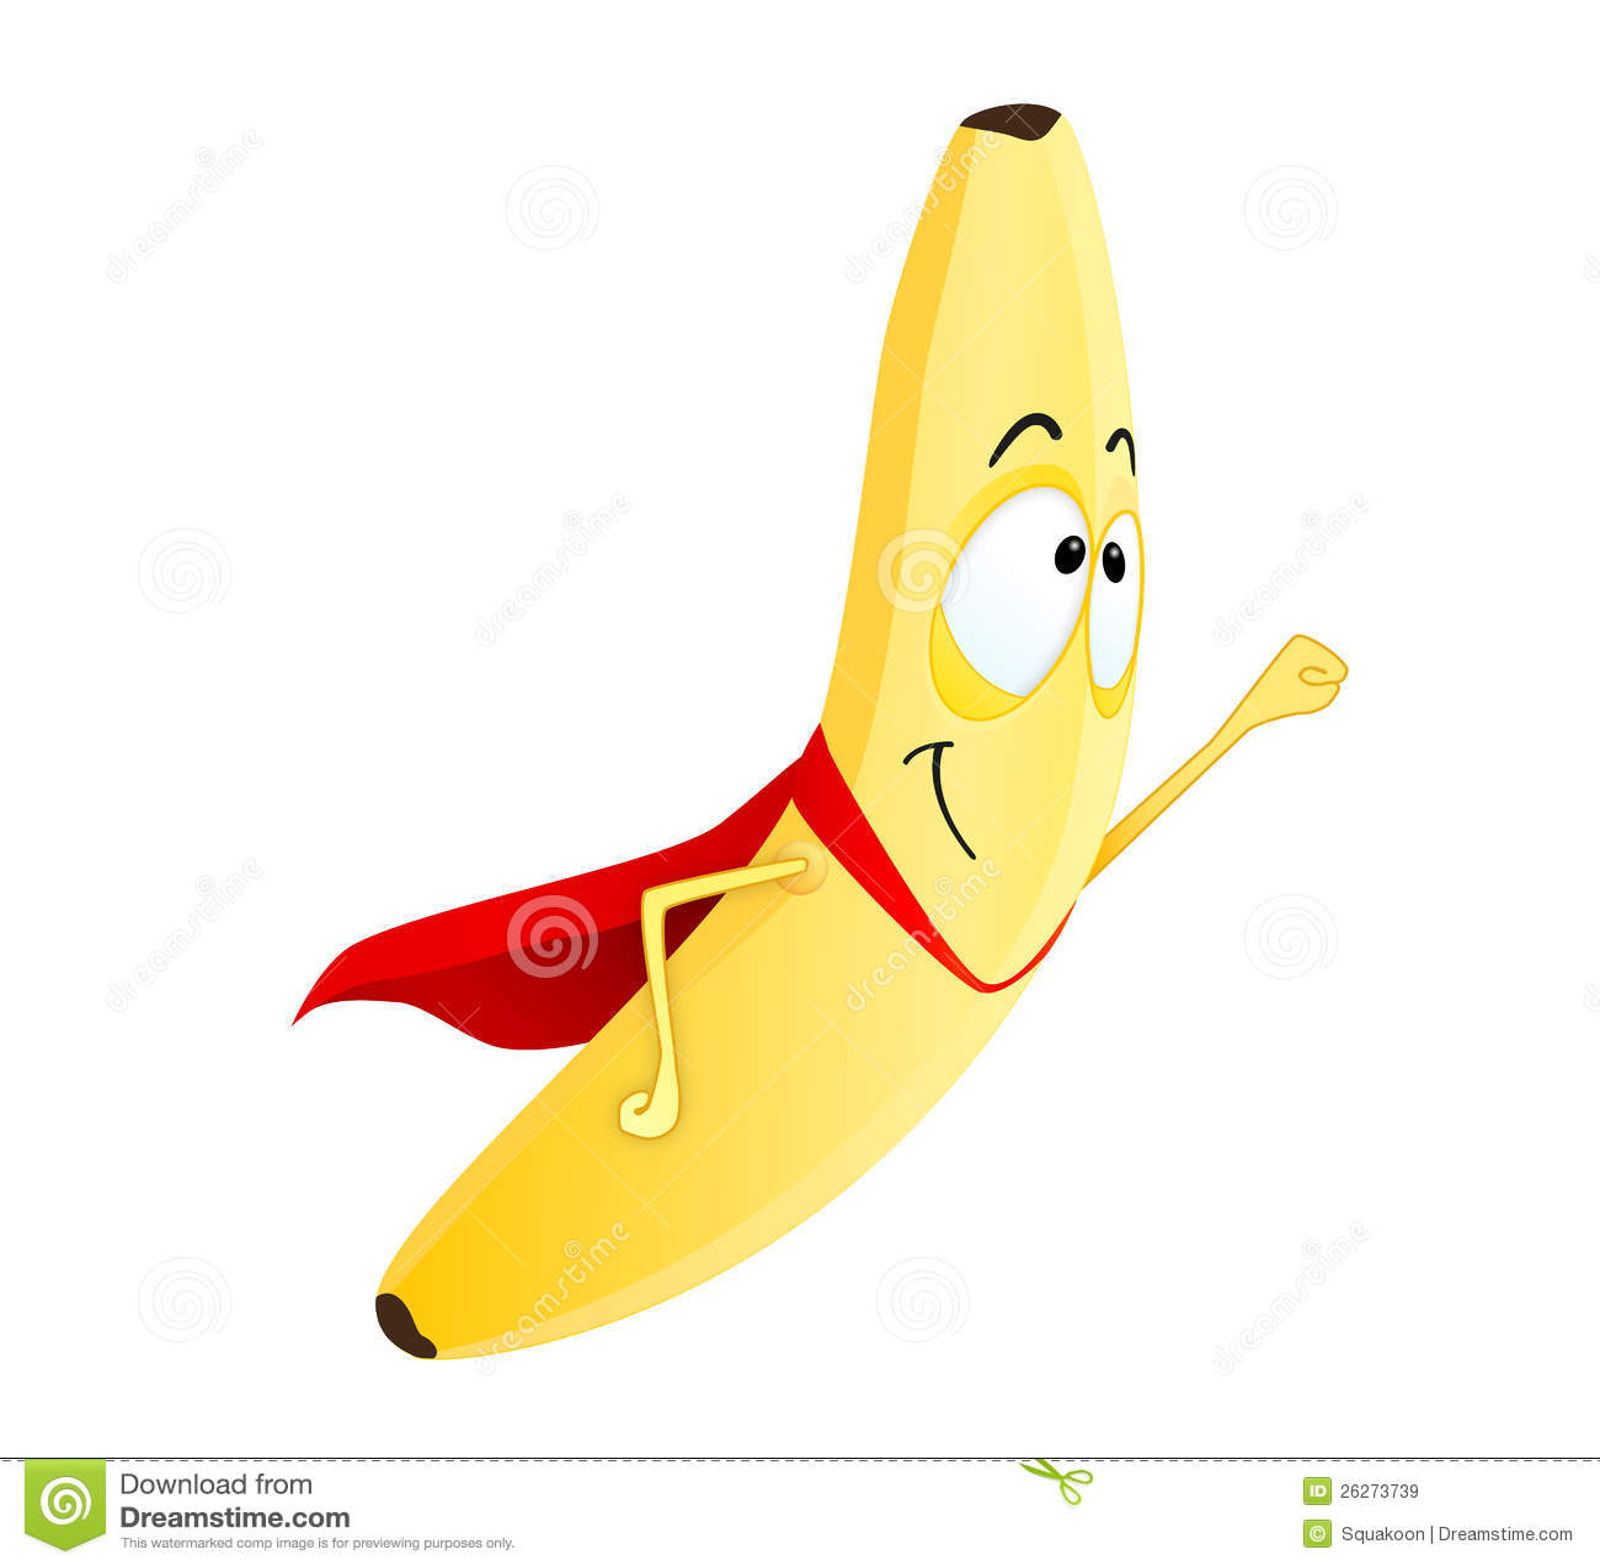 Stock Images Funny Banana Image25352134 further Stock Illustration Cartoon Banana Happy Illustration Expression Image50302846 likewise Royalty Free Stock Images Cute Banana Superhero Image26273739 additionally Red Team Journal Does Economics further Royalty Free Stock Images Crazy Cartoon Yellow Banana Fruit Character Go Bananas Star Eye Jumping Going Image34960439. on banana cartoon character